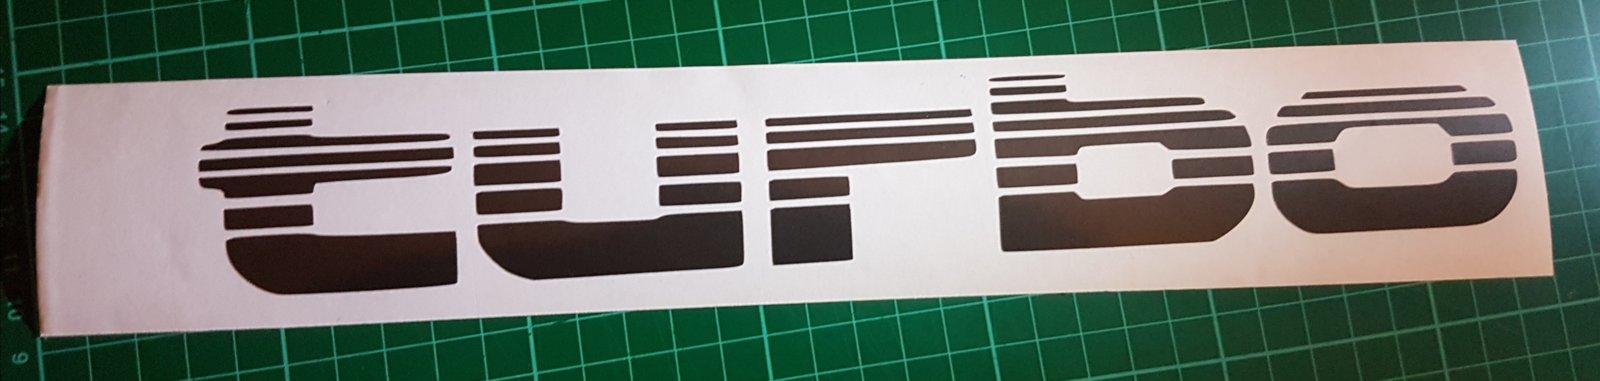 5CD6E63F-CDF5-41B5-A439-00E253019149.jpeg